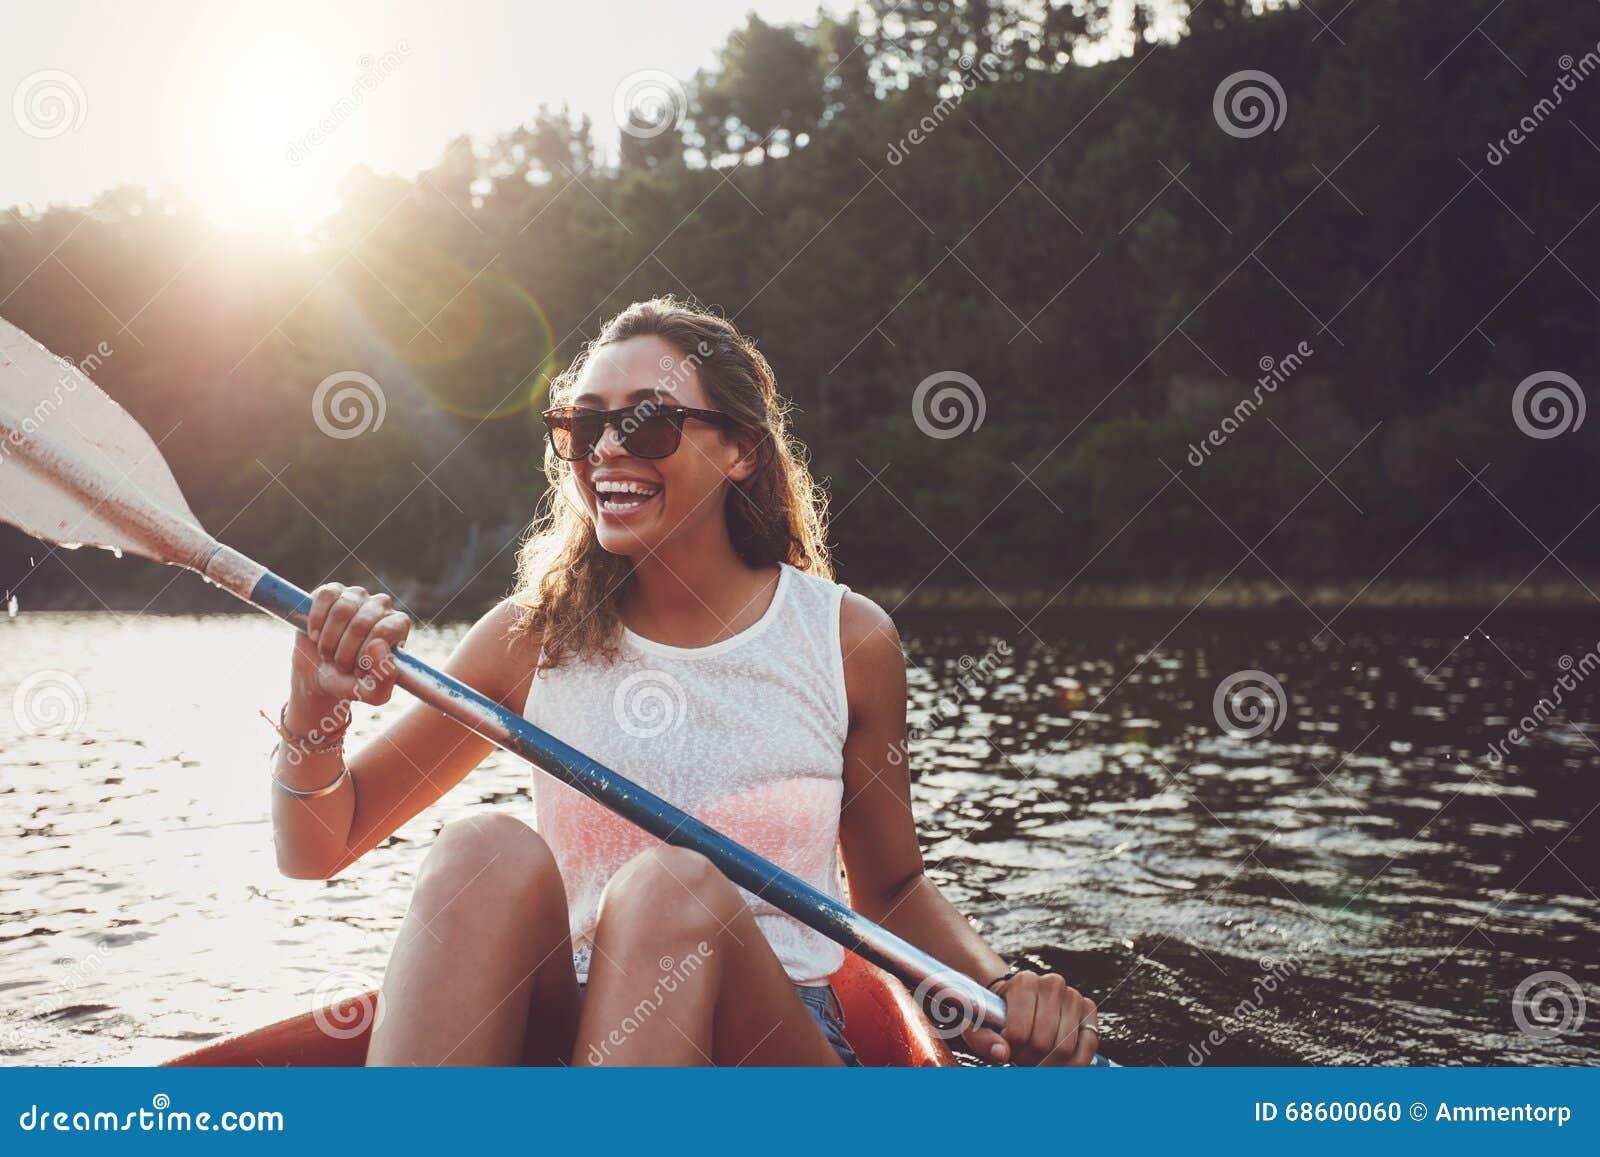 Smiling young woman kayaking on a lake